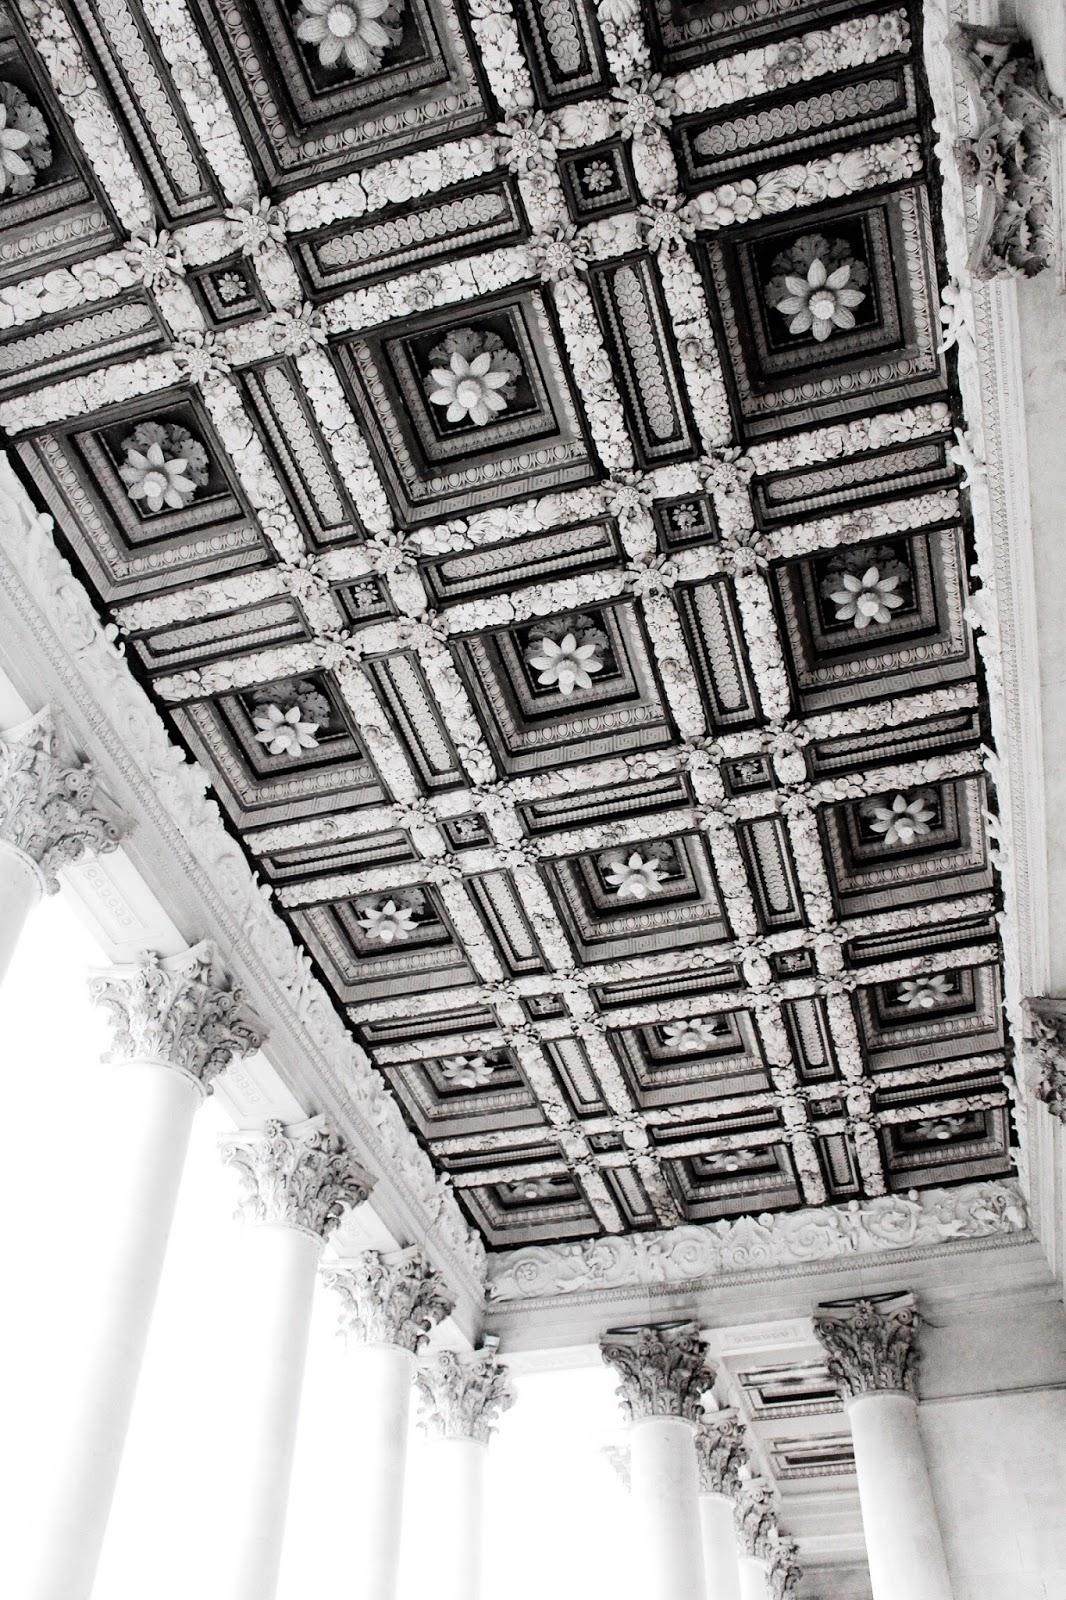 Best Most Stunning Architecture in Cambridge UK